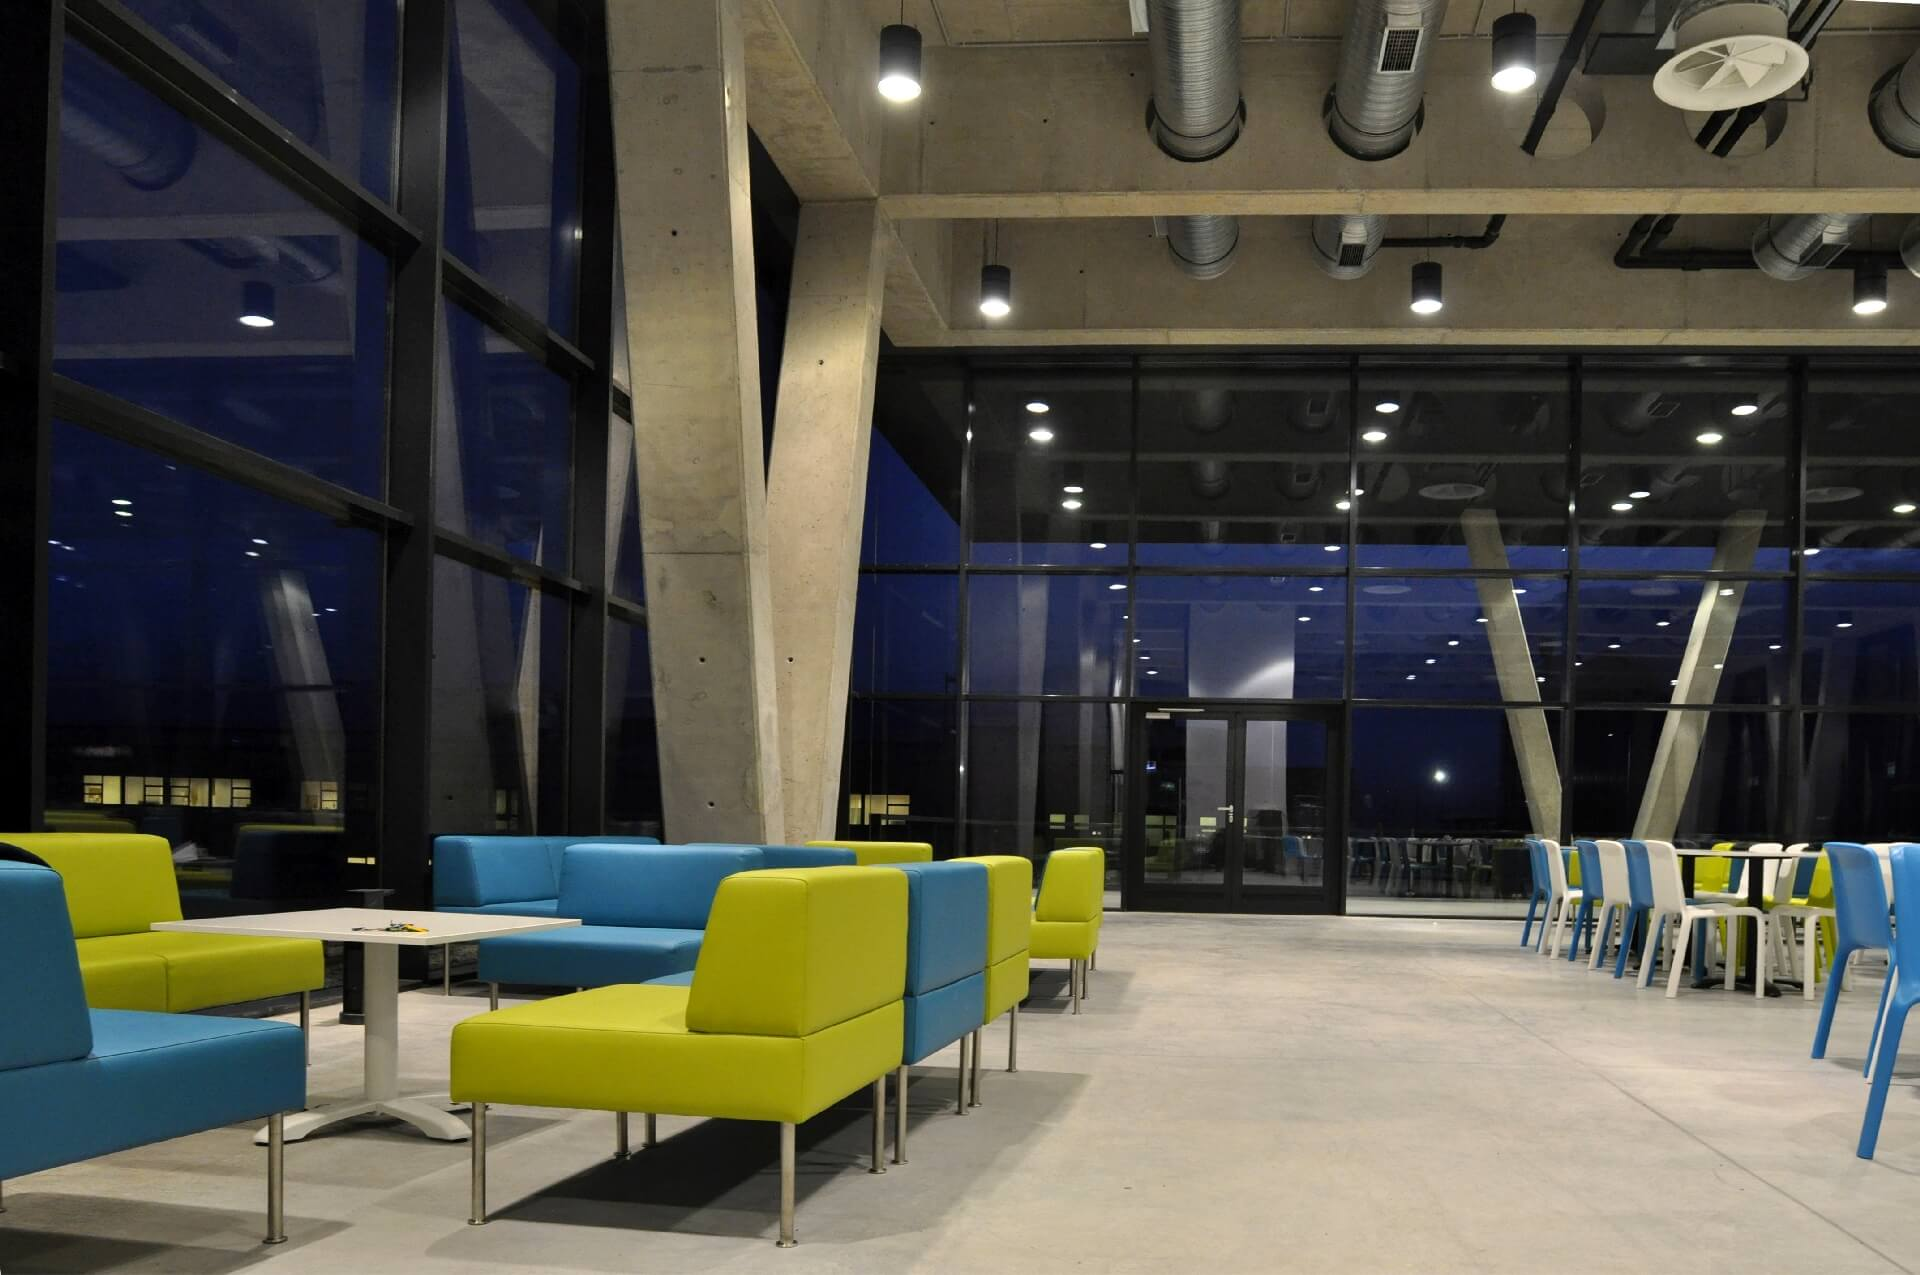 Korda Filmpark Látogatóközpont belső tere